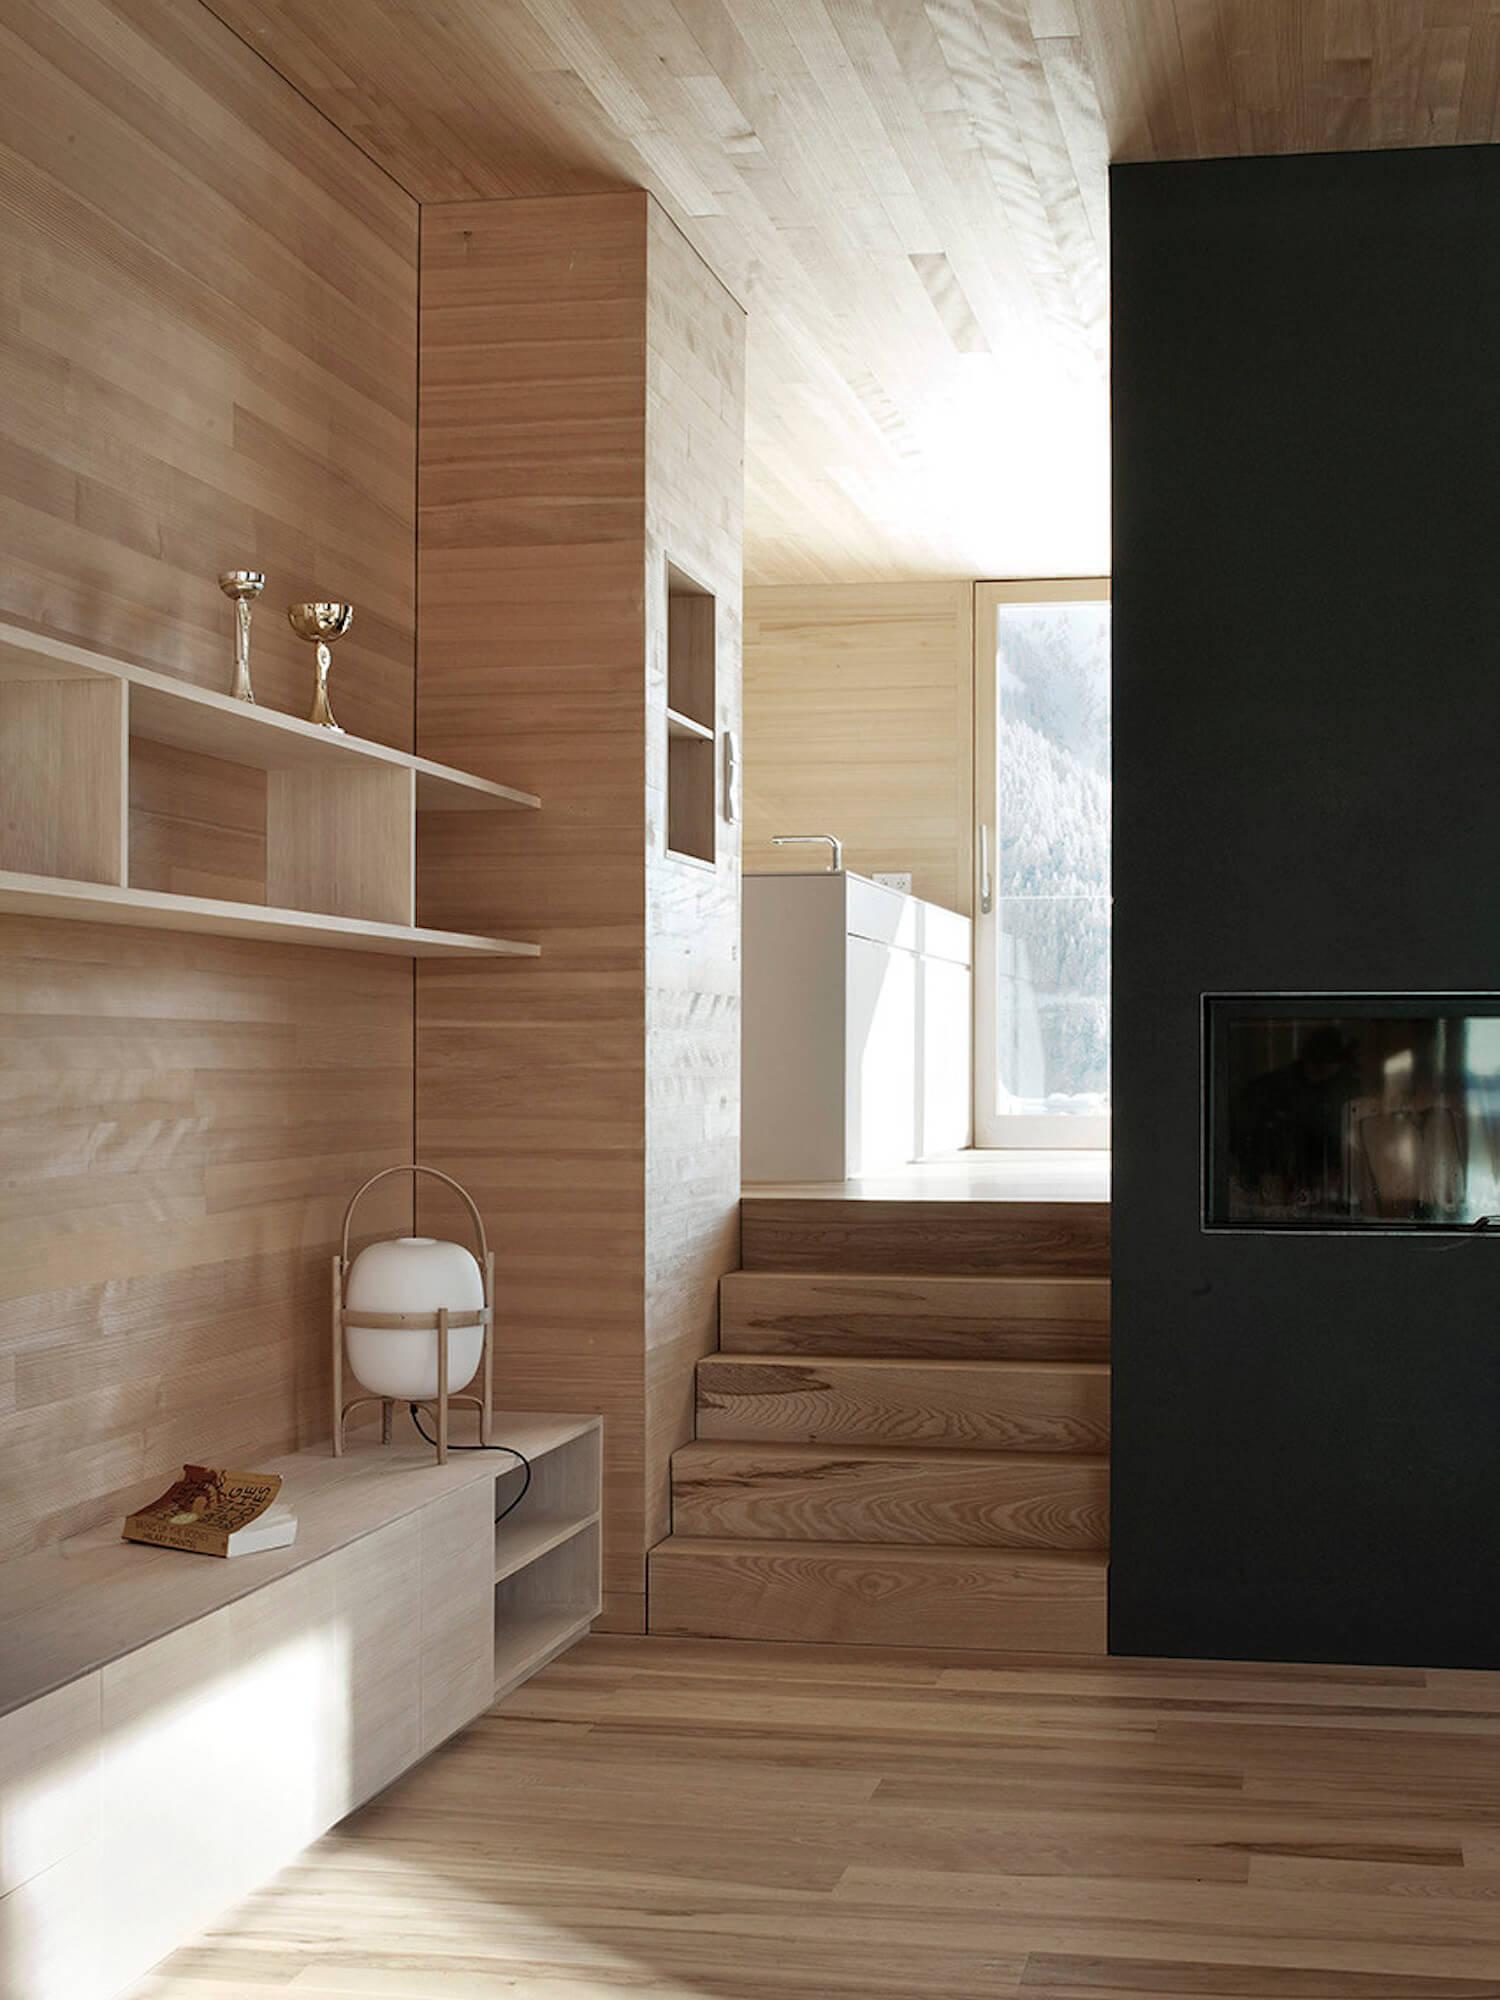 est living haus fontanella barnado bader architects 4